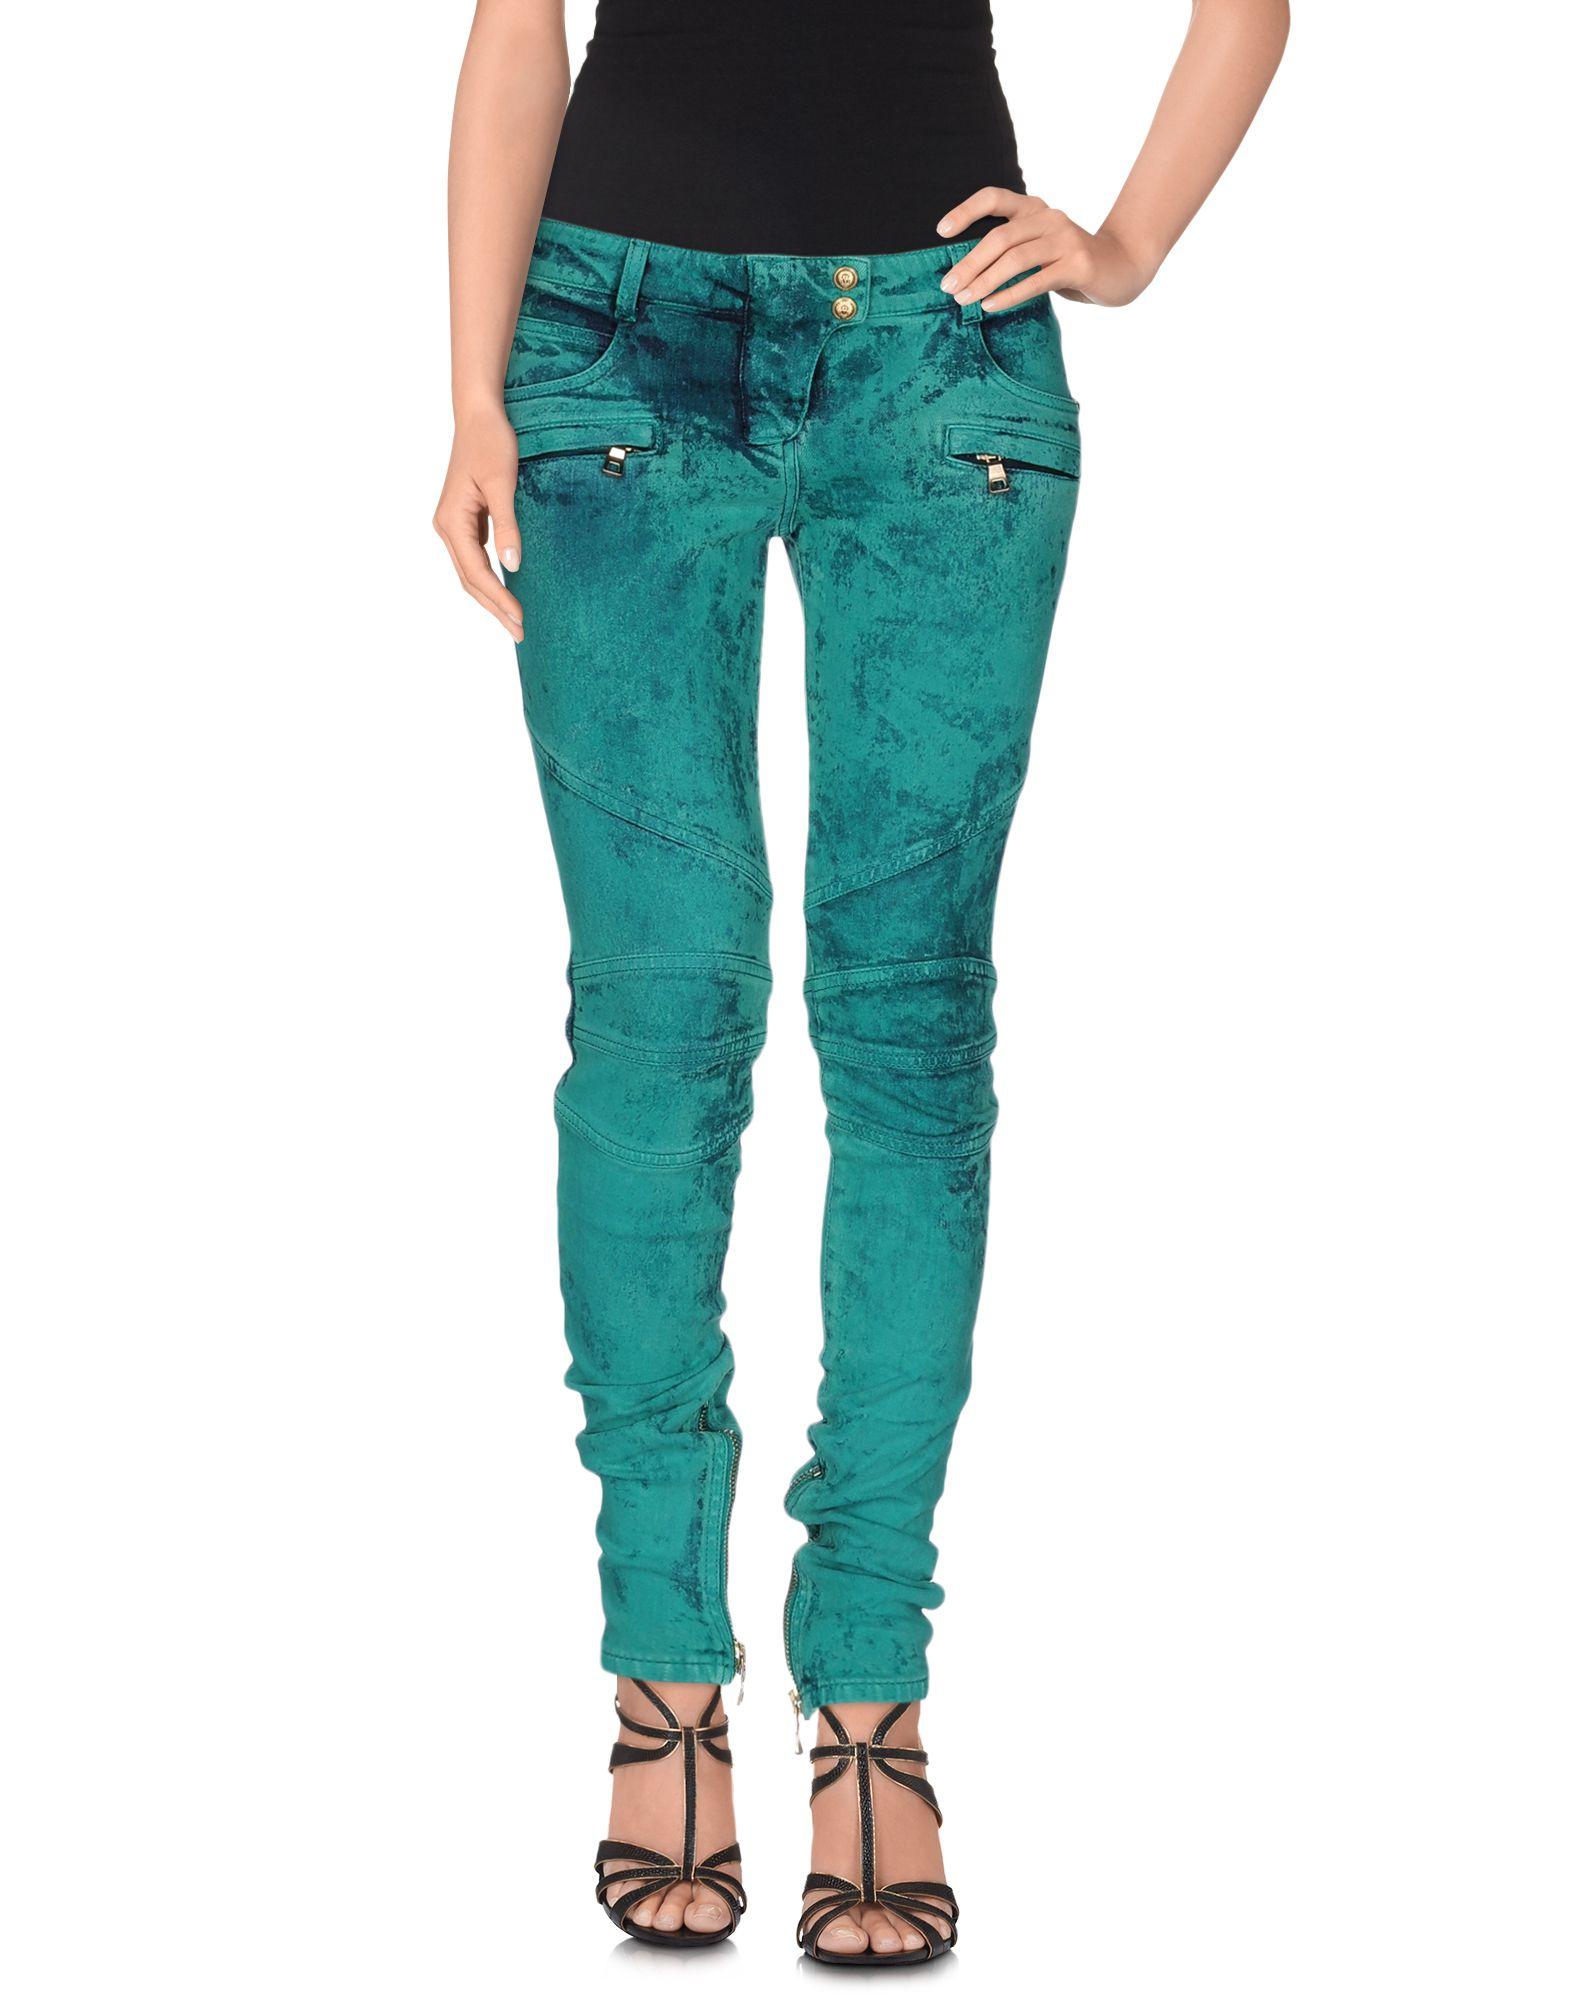 Pantaloni Jeans Balmain Donna - Acquista online su RaU1WR